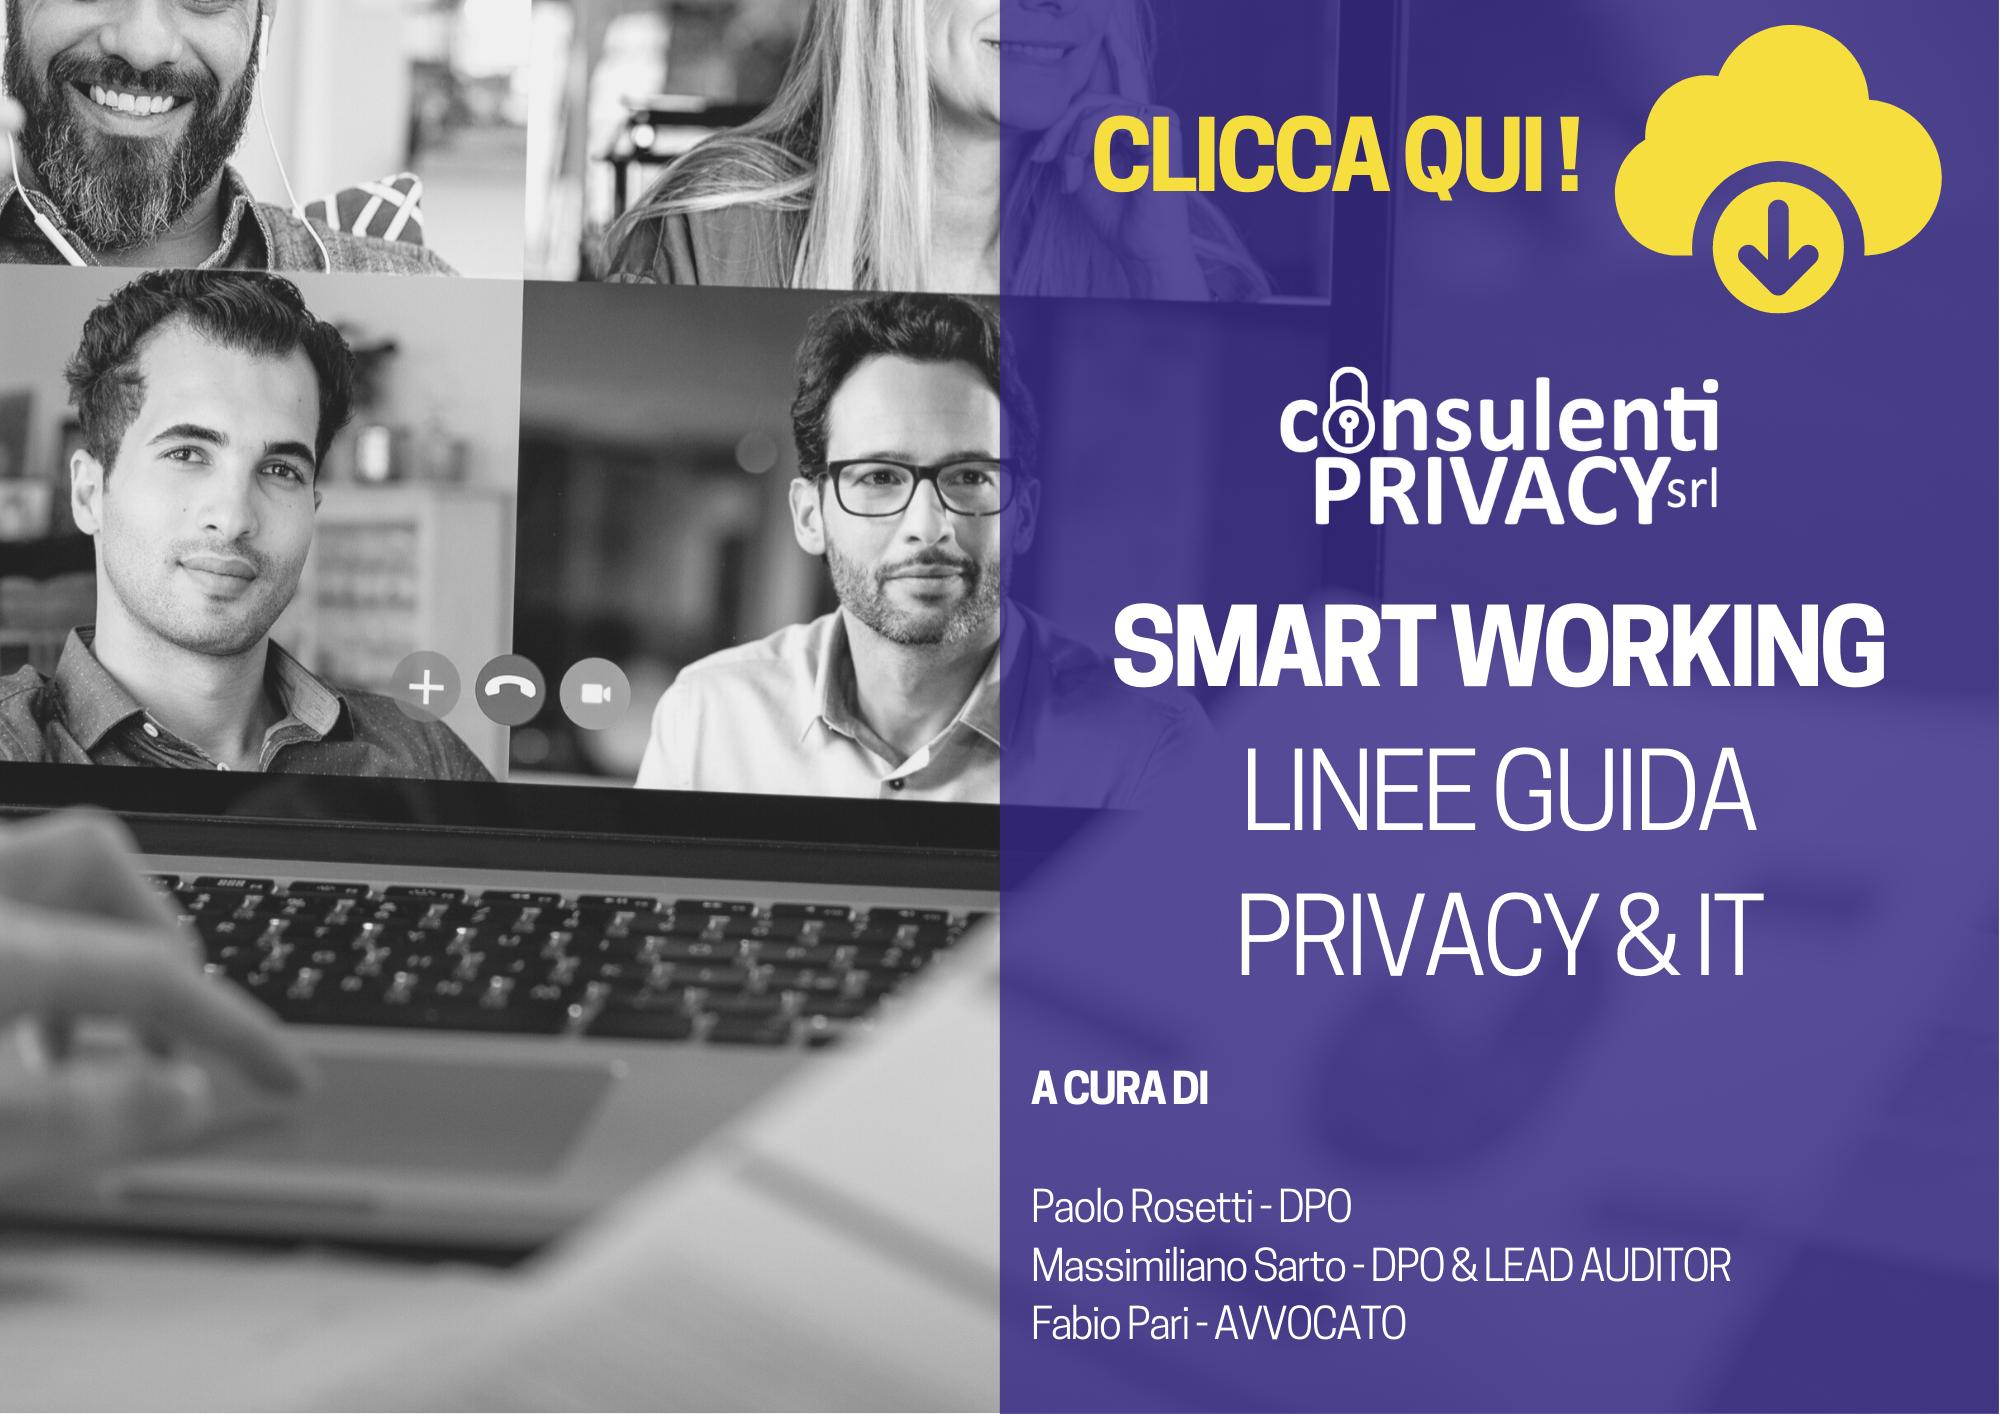 Smart working: linee guida adempimenti privacy